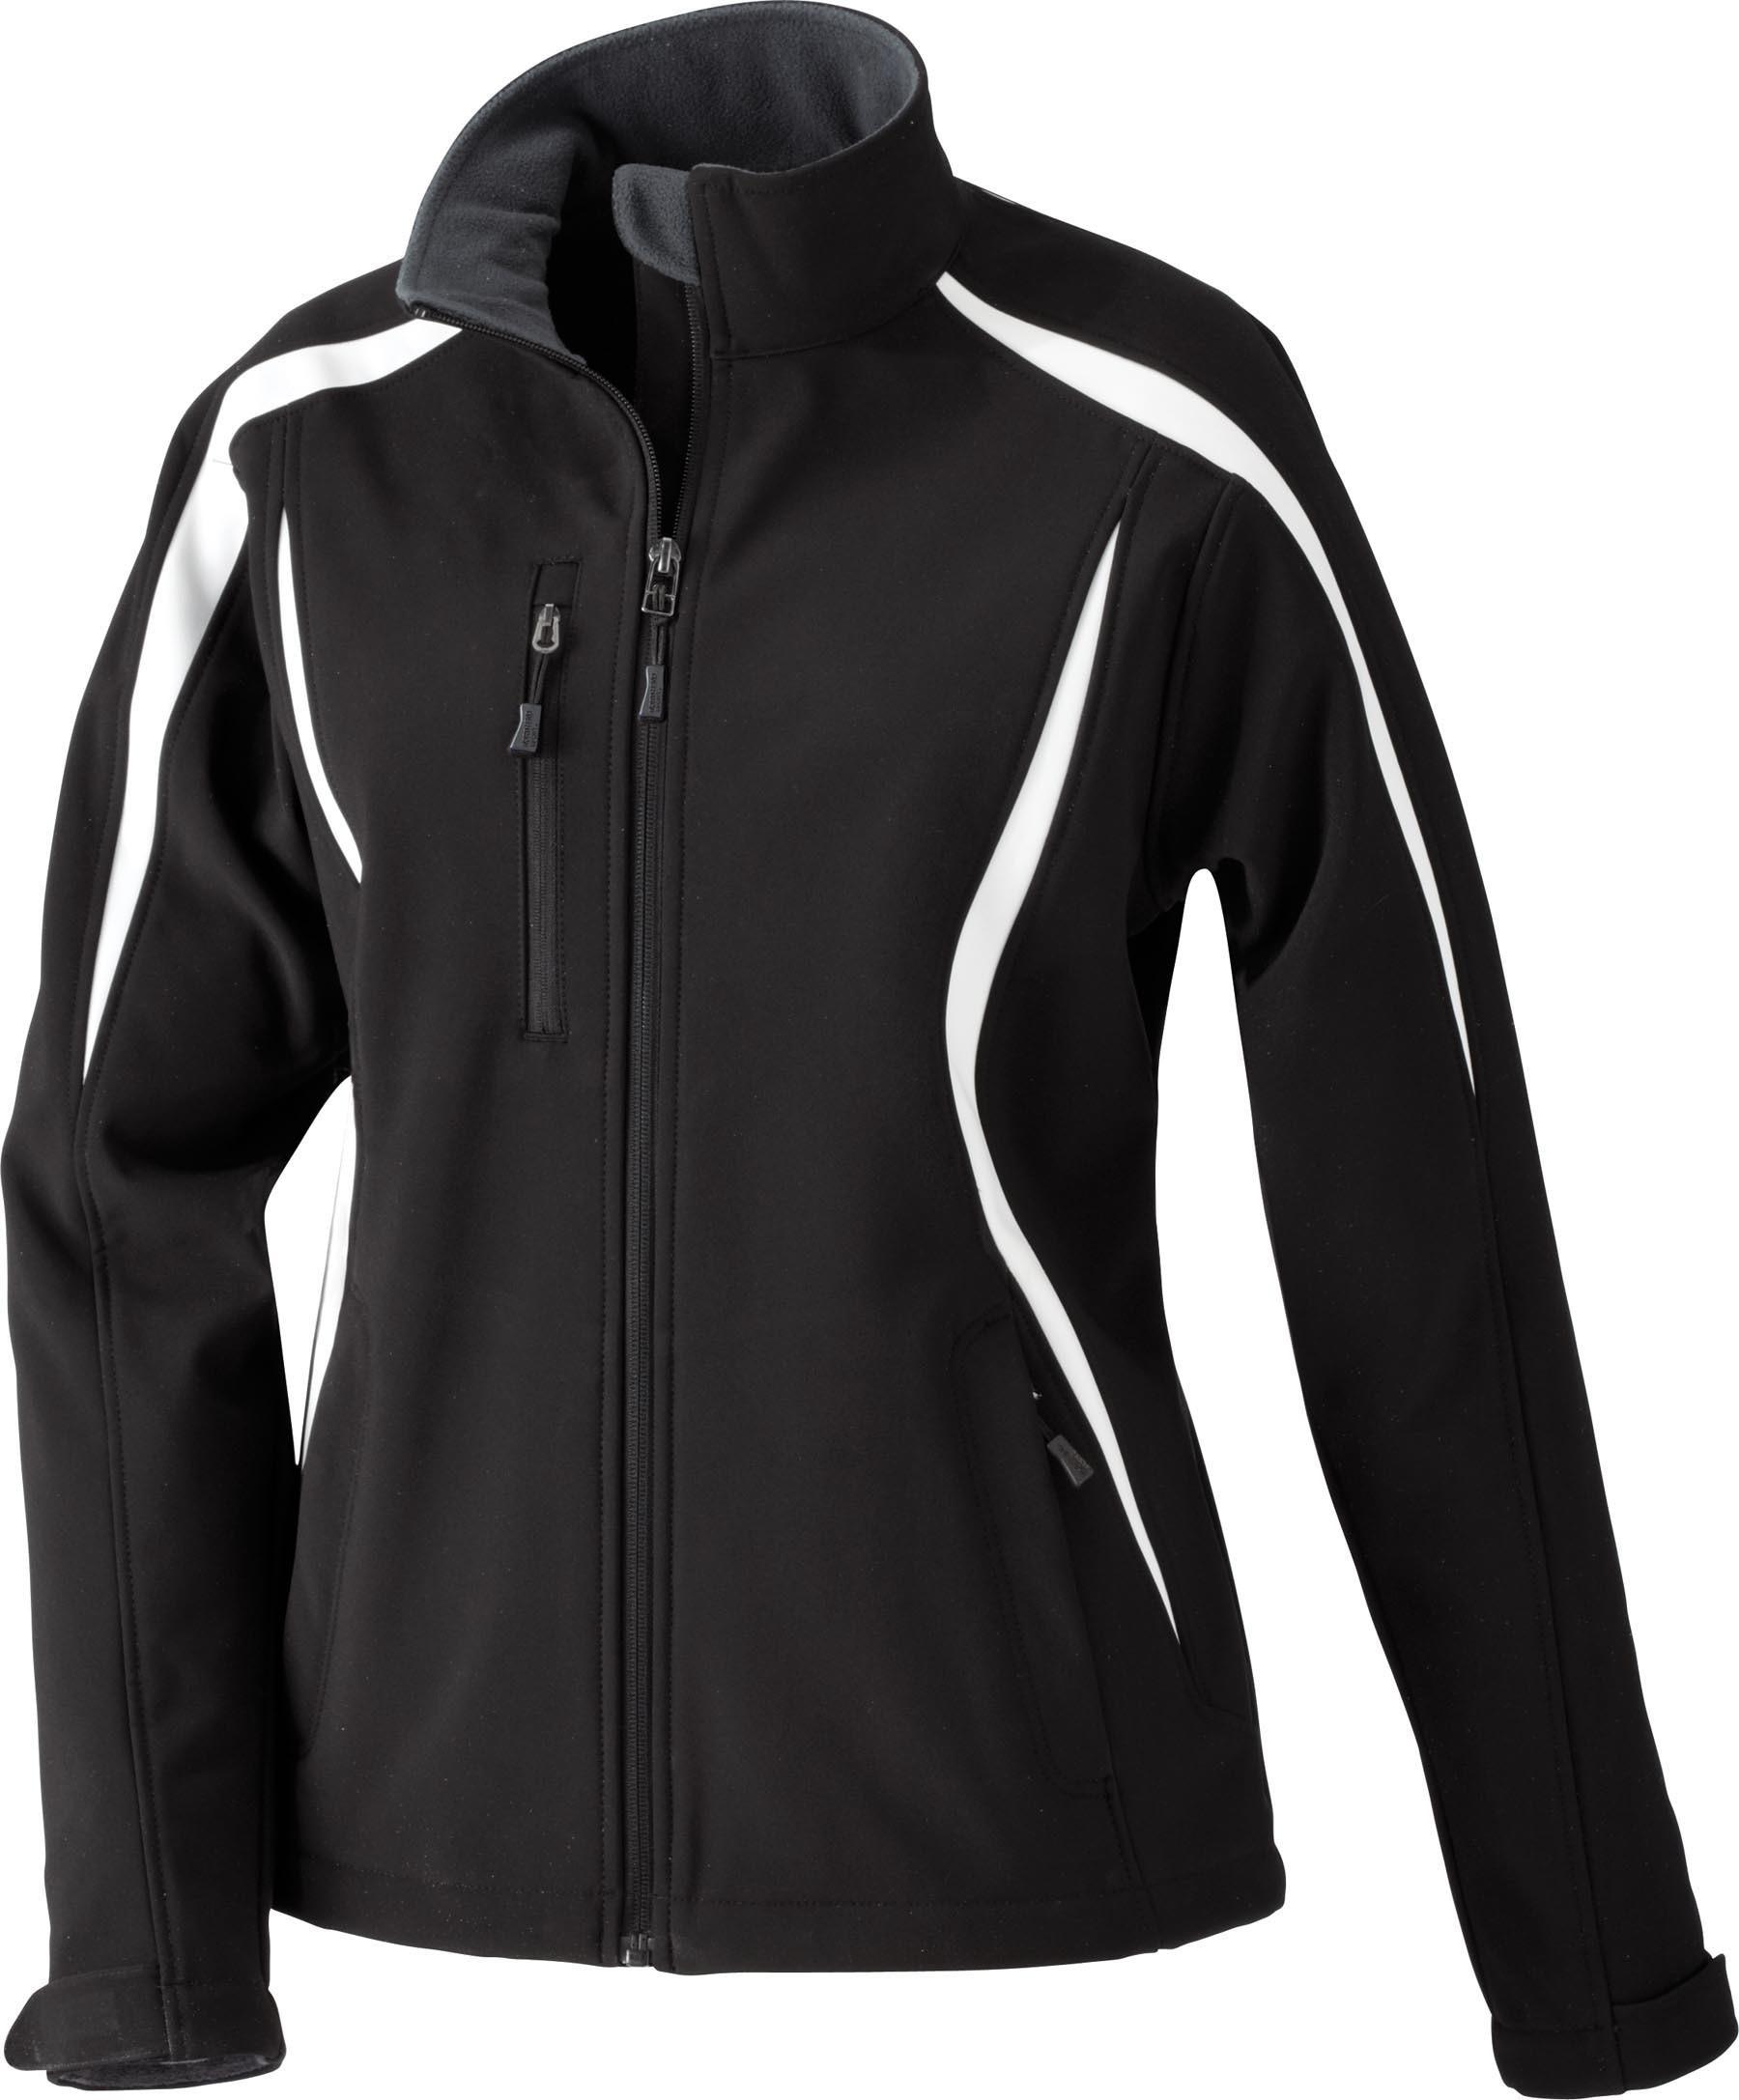 Ash City UTK 1 Warm.Logik 78650 - Enzo Ladies' Color-Block Soft Shell Jacket